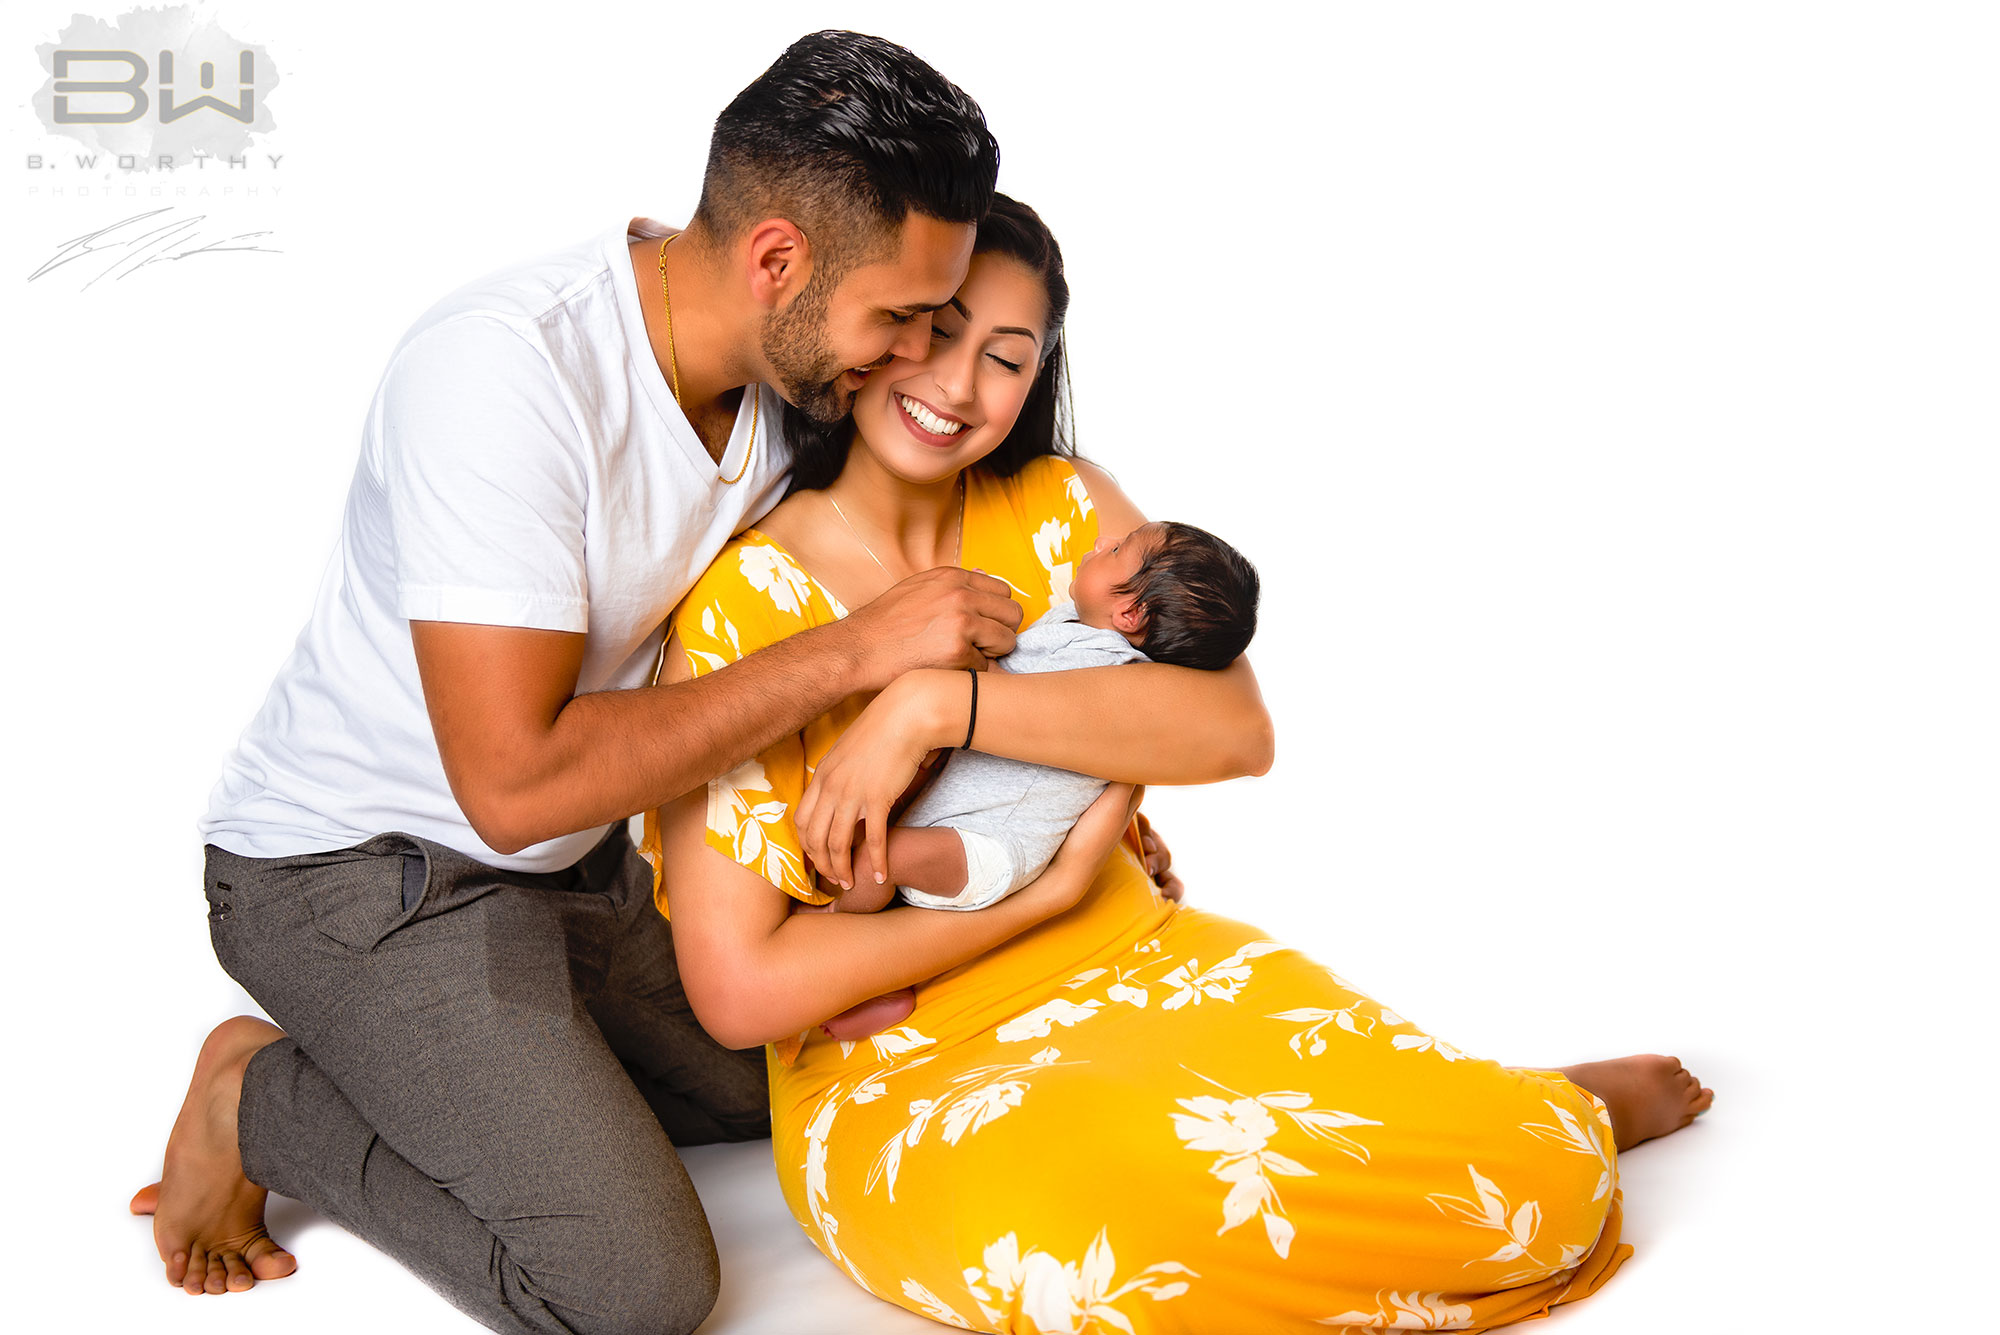 https://bworthyphotography.smugmug.com/BW-Website-Newborn-Session/Dhatt-Newborn-Session